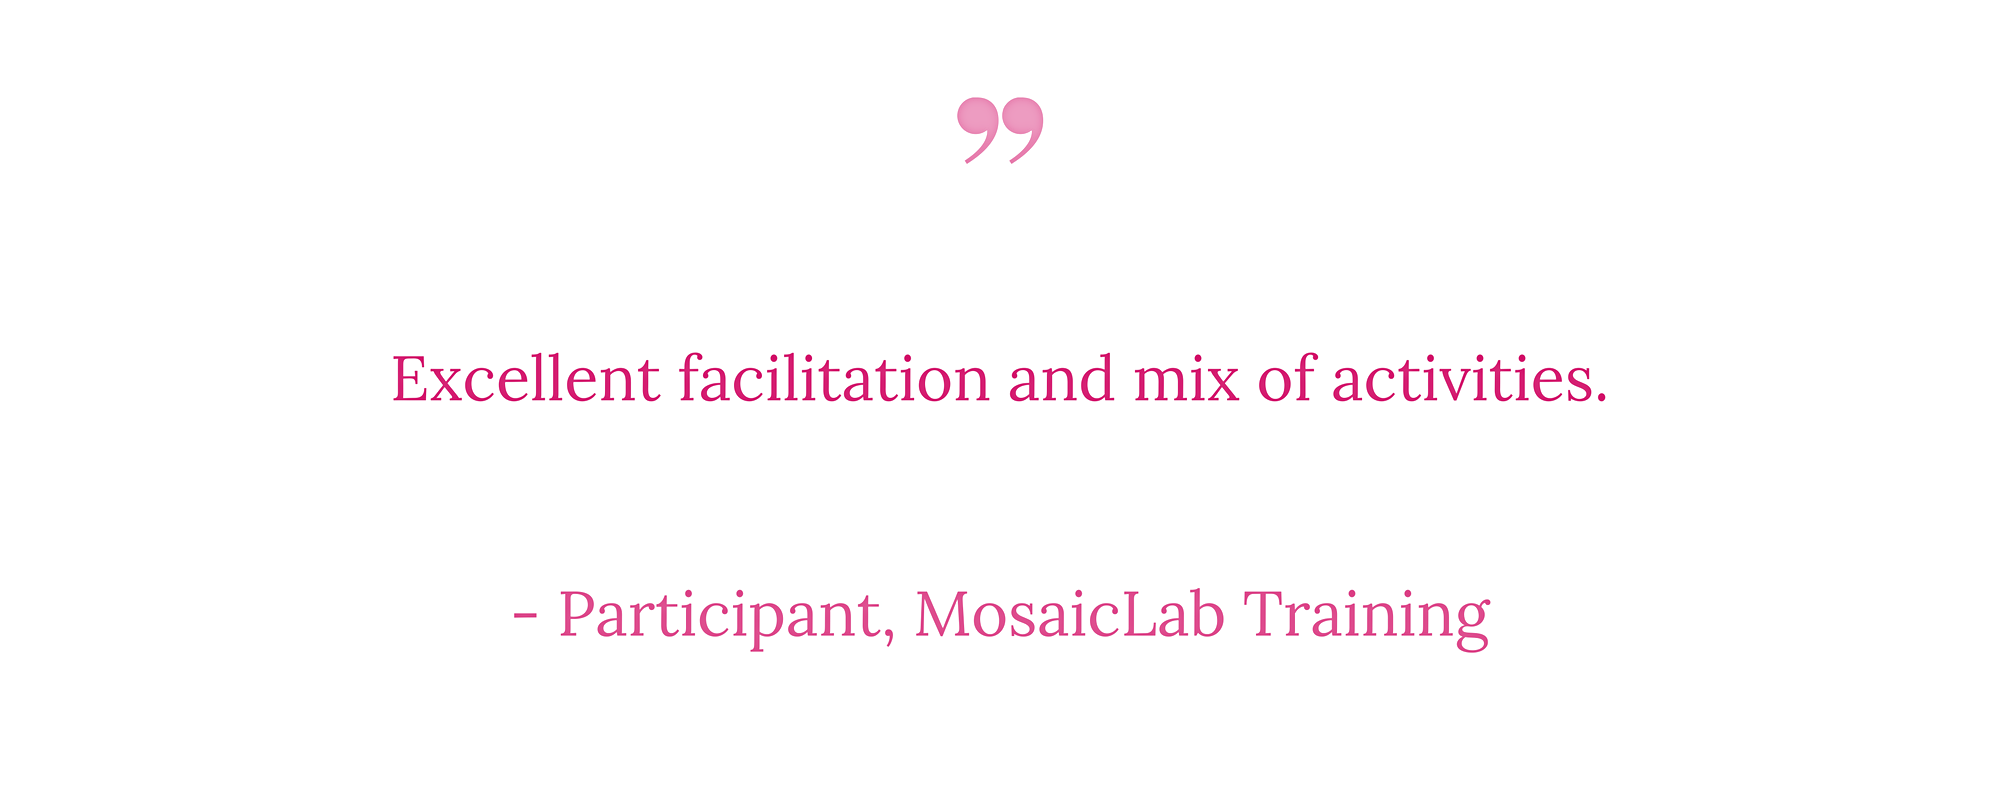 MosaicLab training